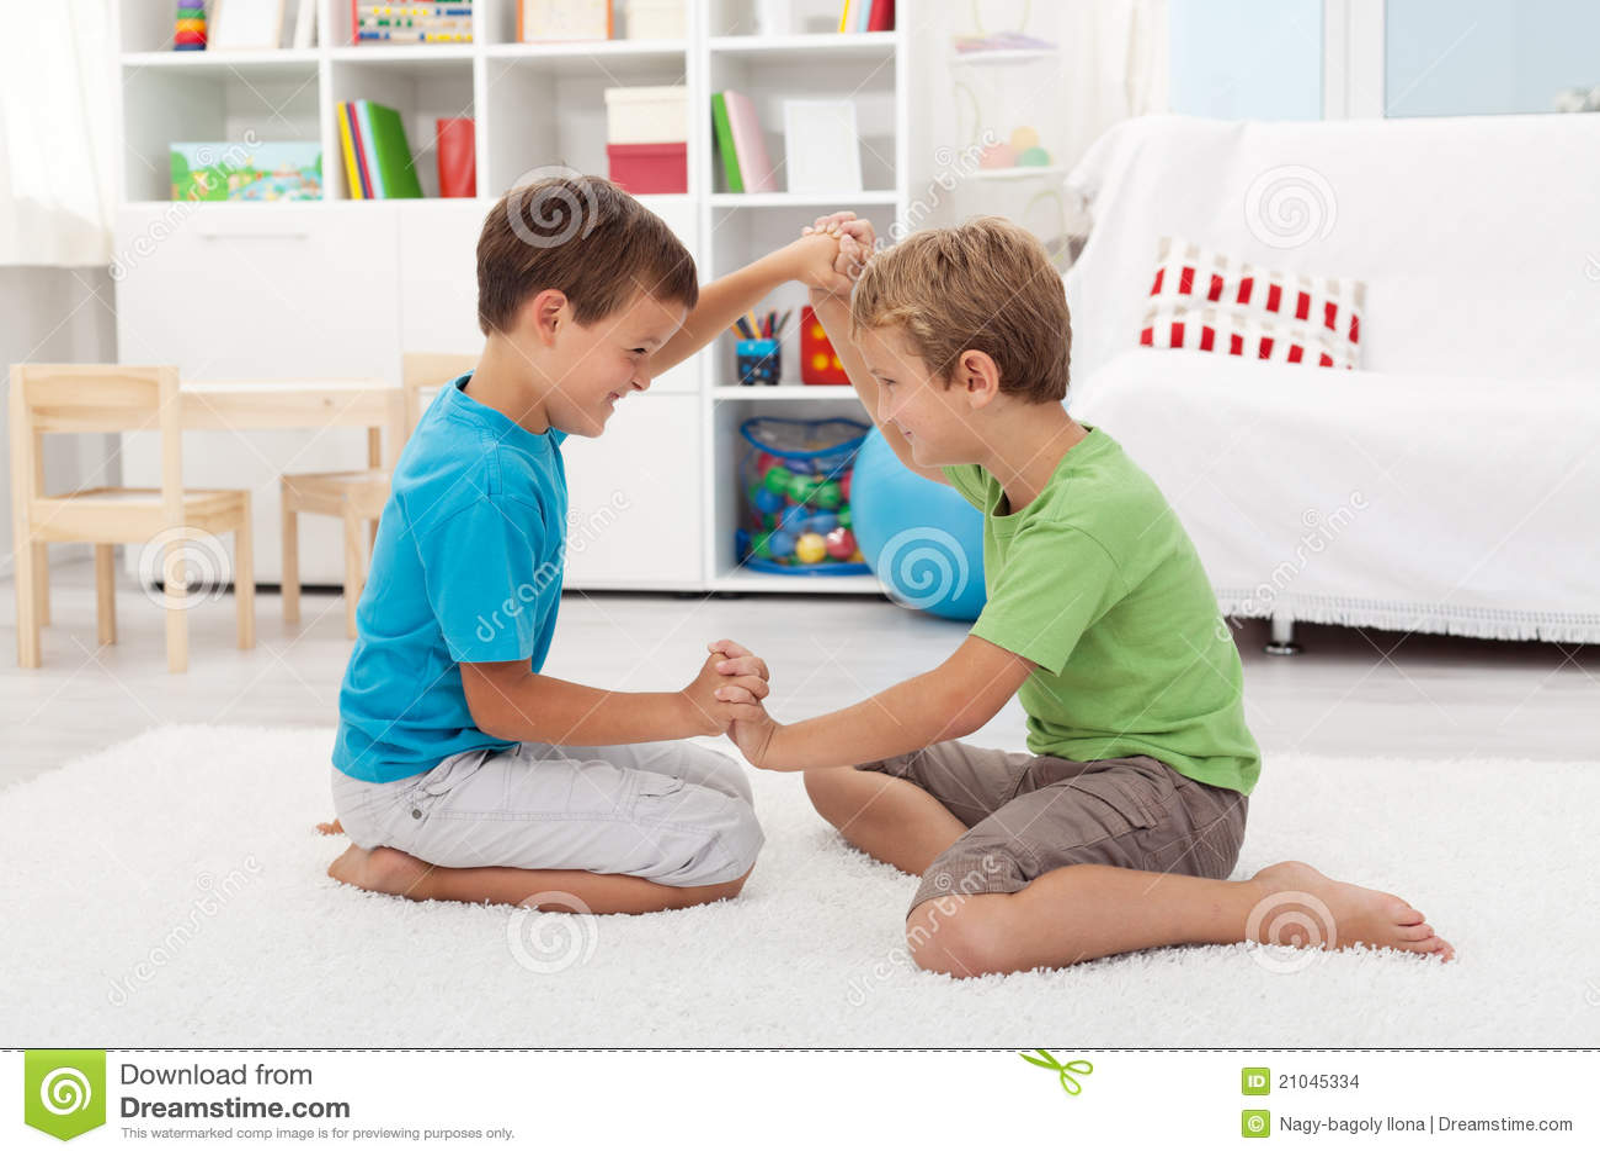 Kids Wrestling On The Floor Stock Images